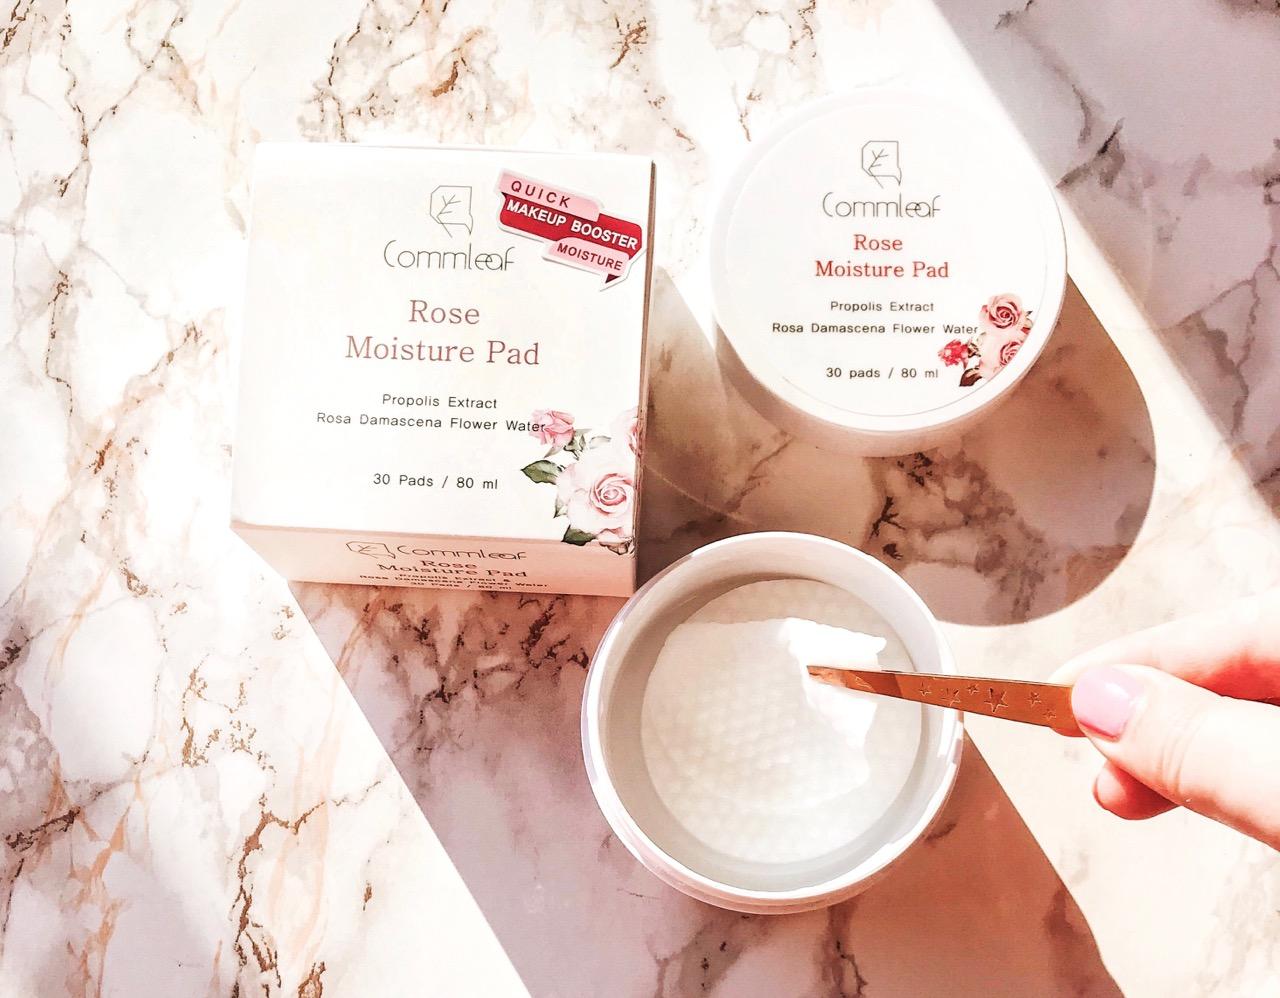 Commleaf rose moisture pad korean skincare review